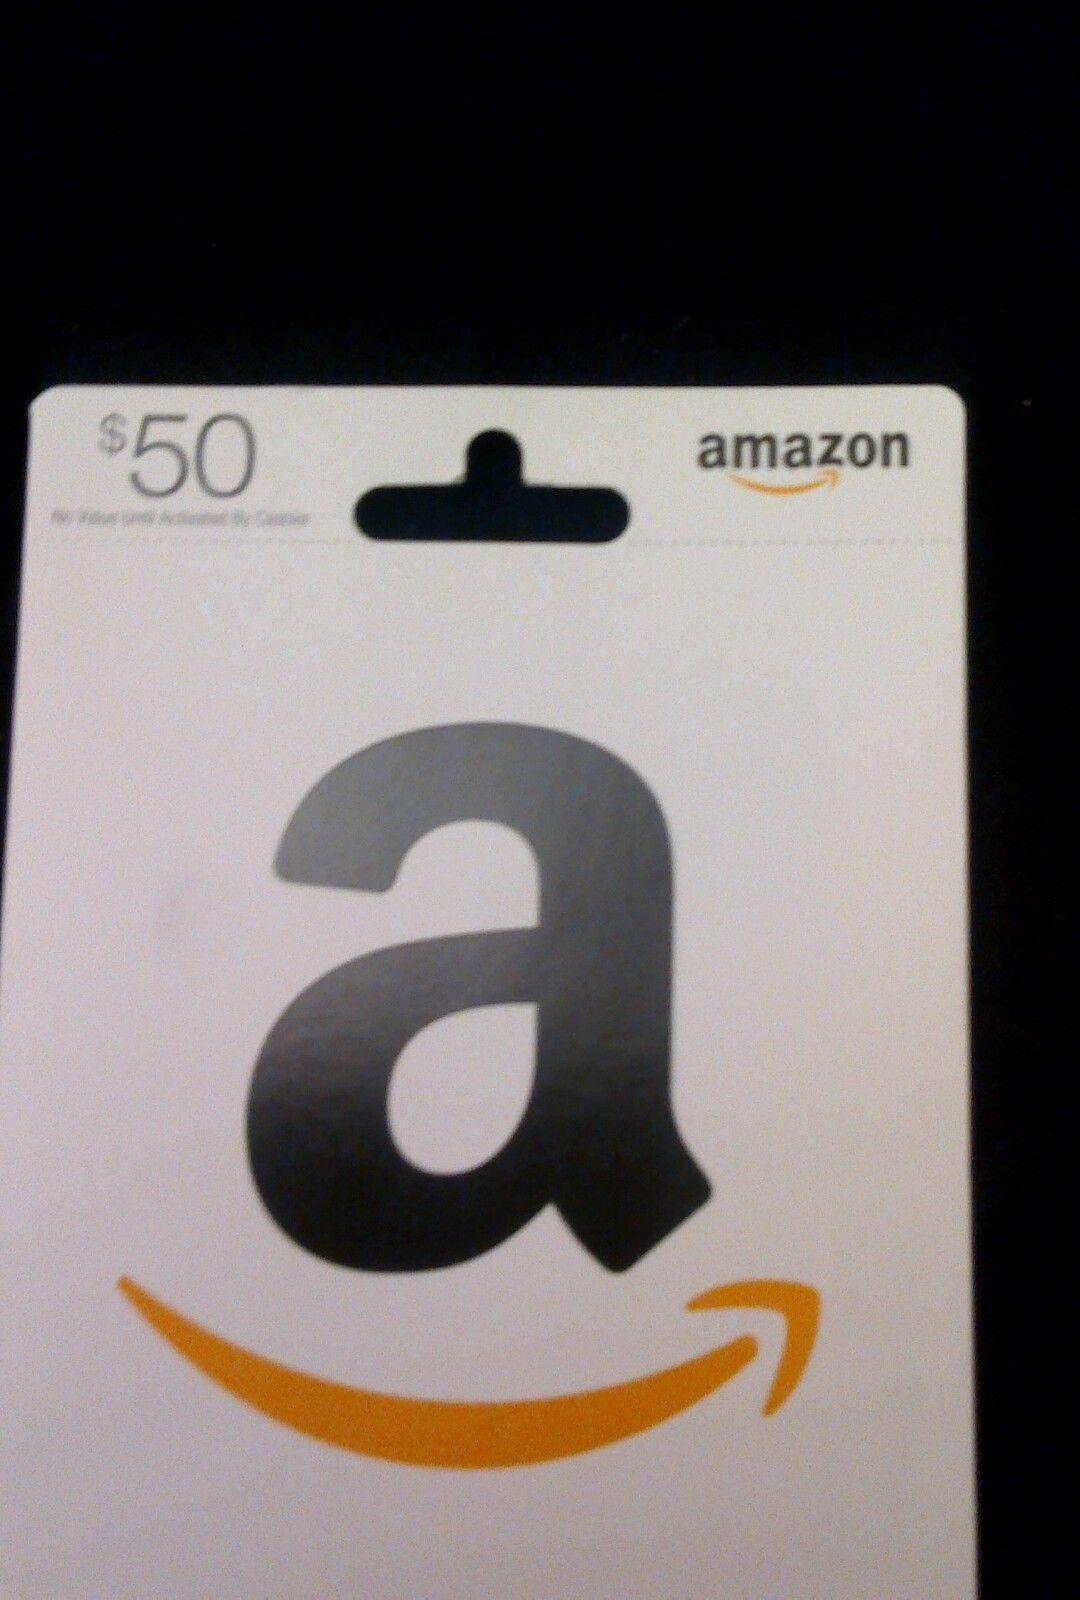 $50 amazon gift card promo